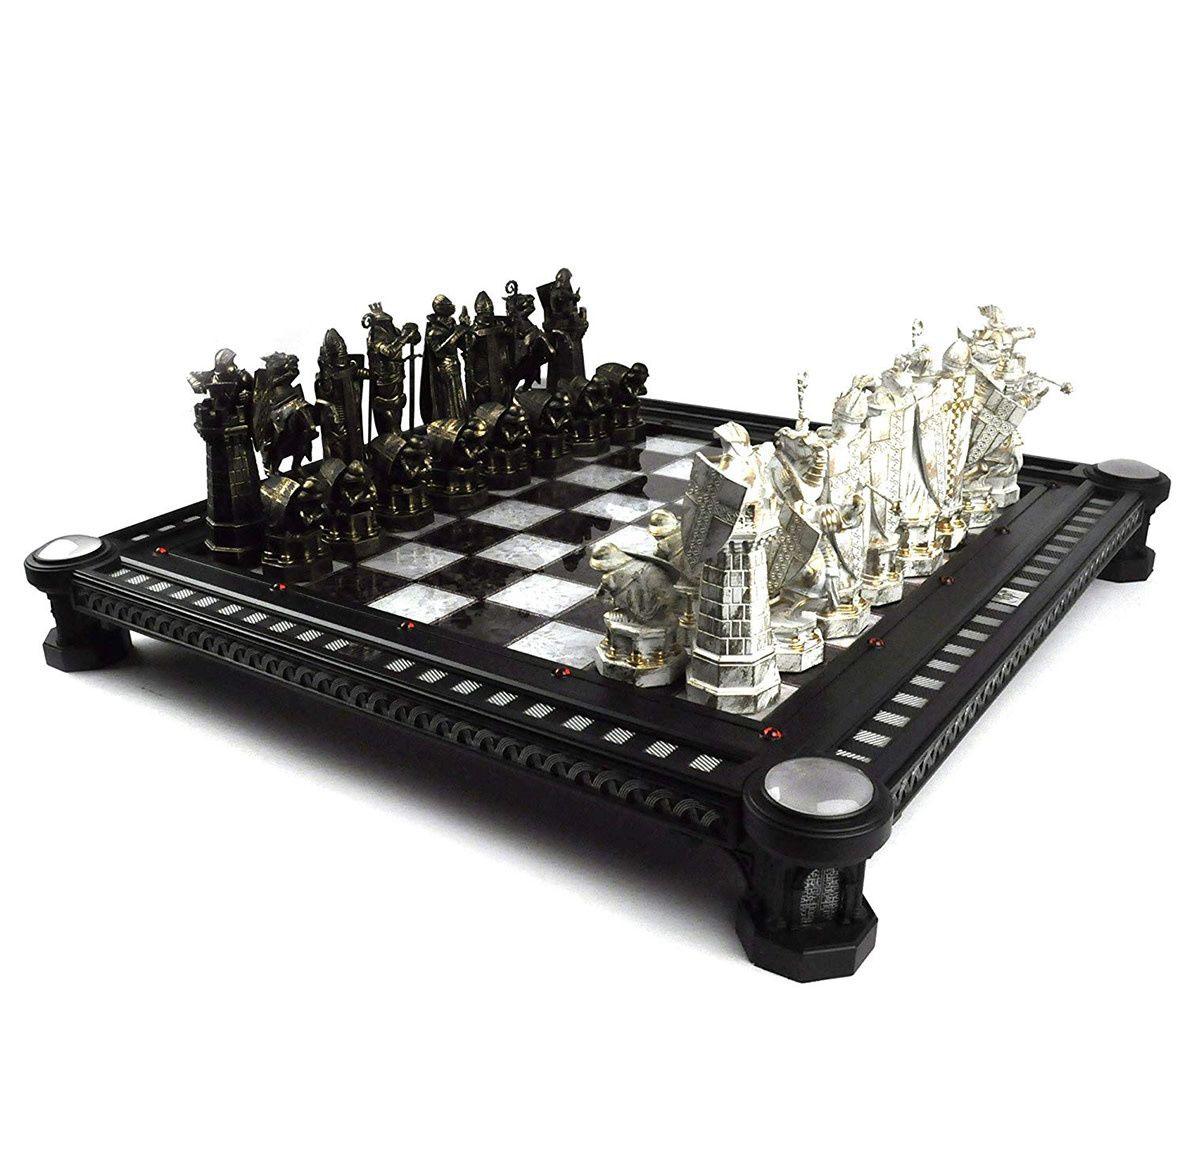 Harry Potter Final Challenge Chess Set Harry Potter Chess Harry Potter Chess Set Themed Chess Sets